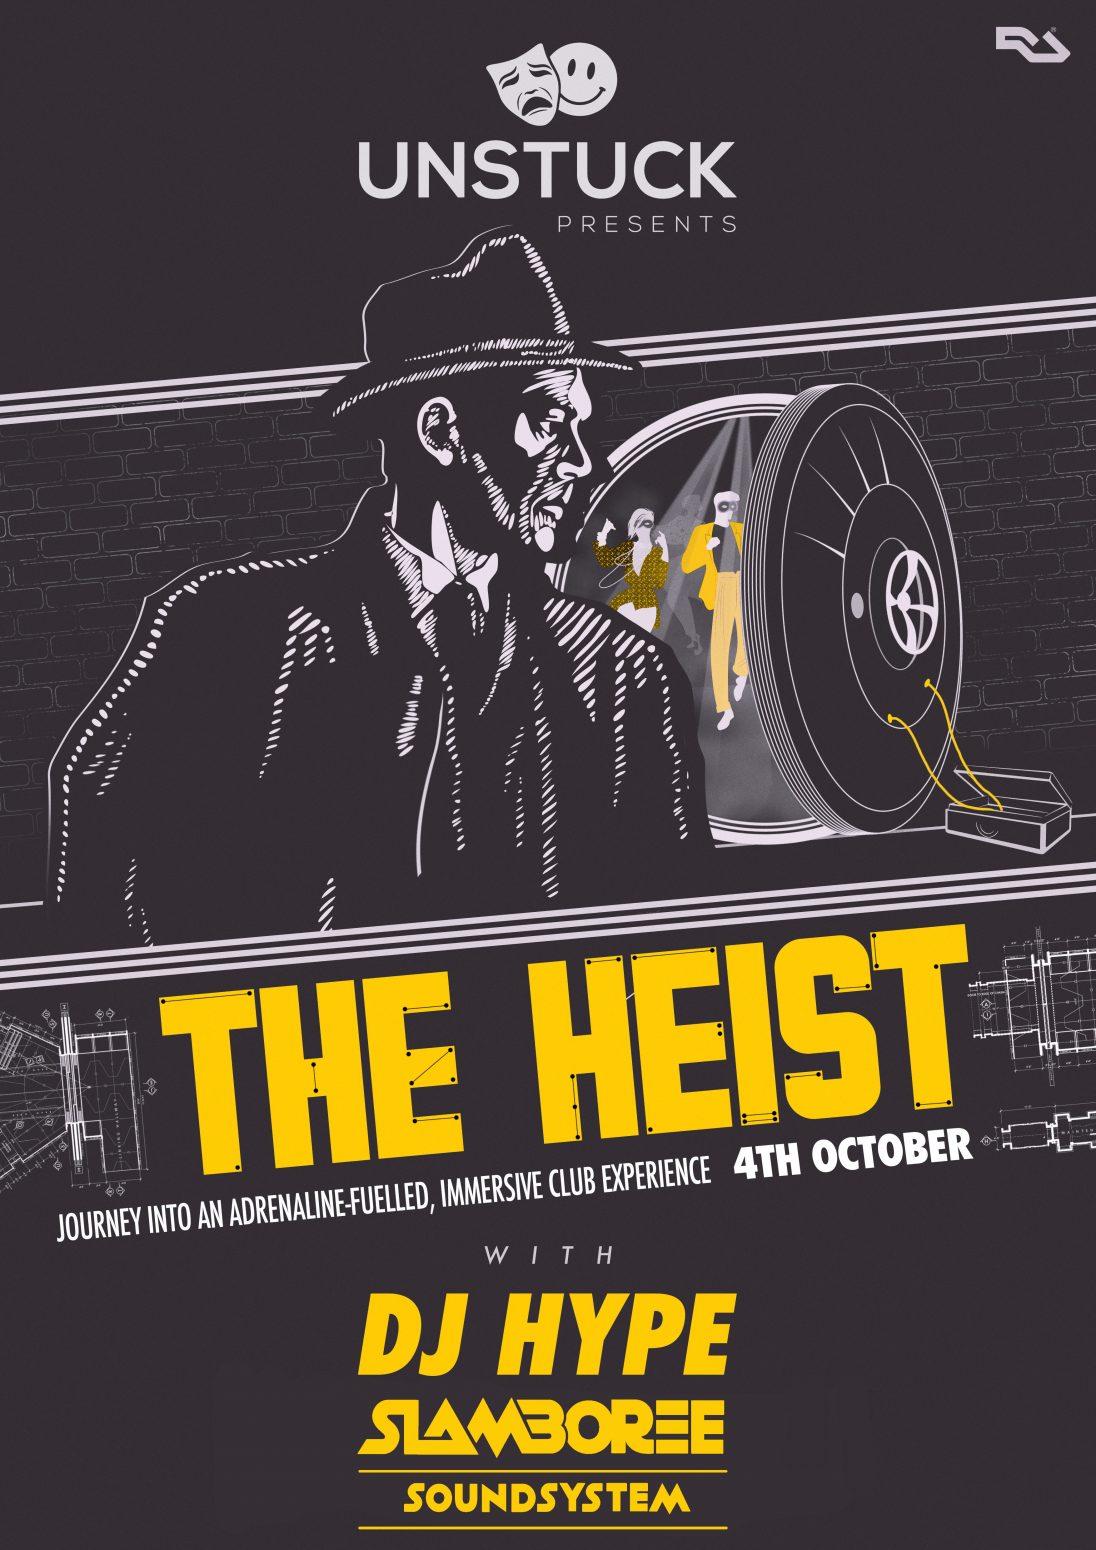 The Heist 4th Oct 2019